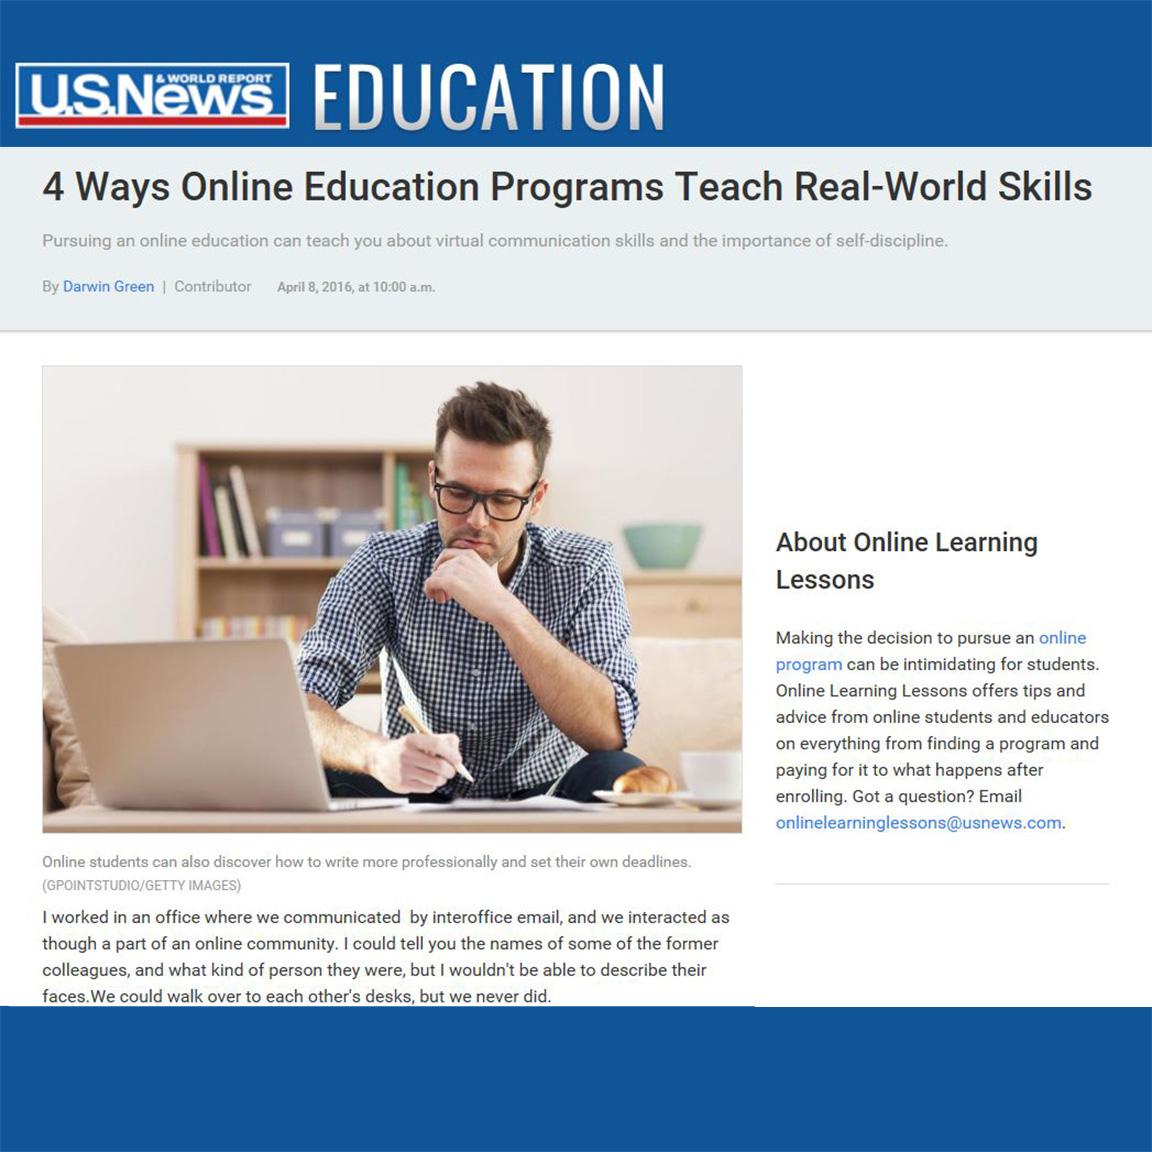 Rio Salado College | RioNews: Online Education Teaches Real-World Skills